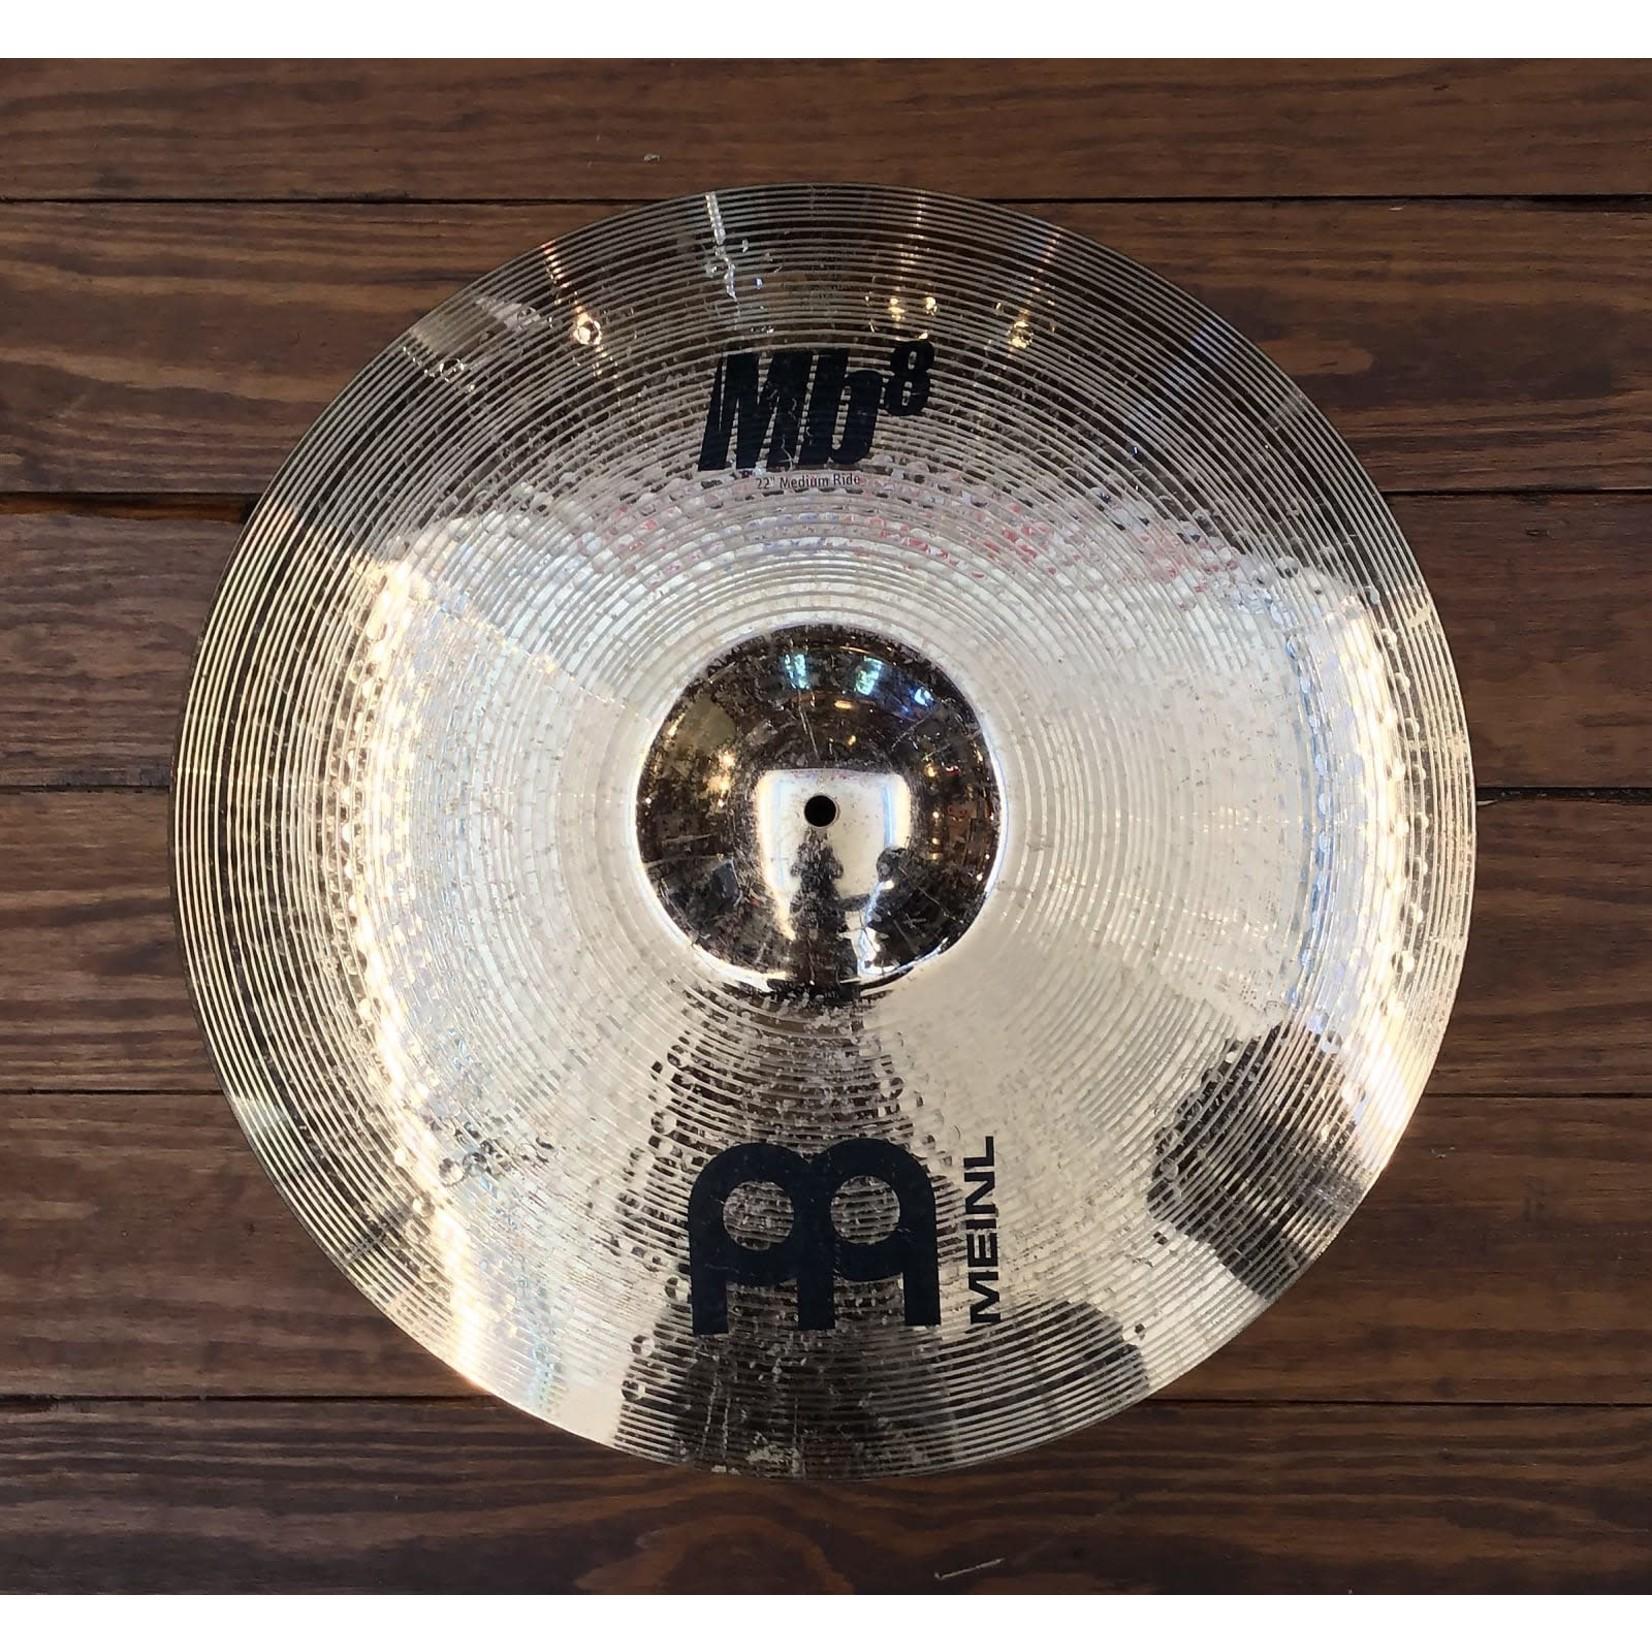 "Meinl USED Meinl Mb8 22"" Medium Ride Cymbal"